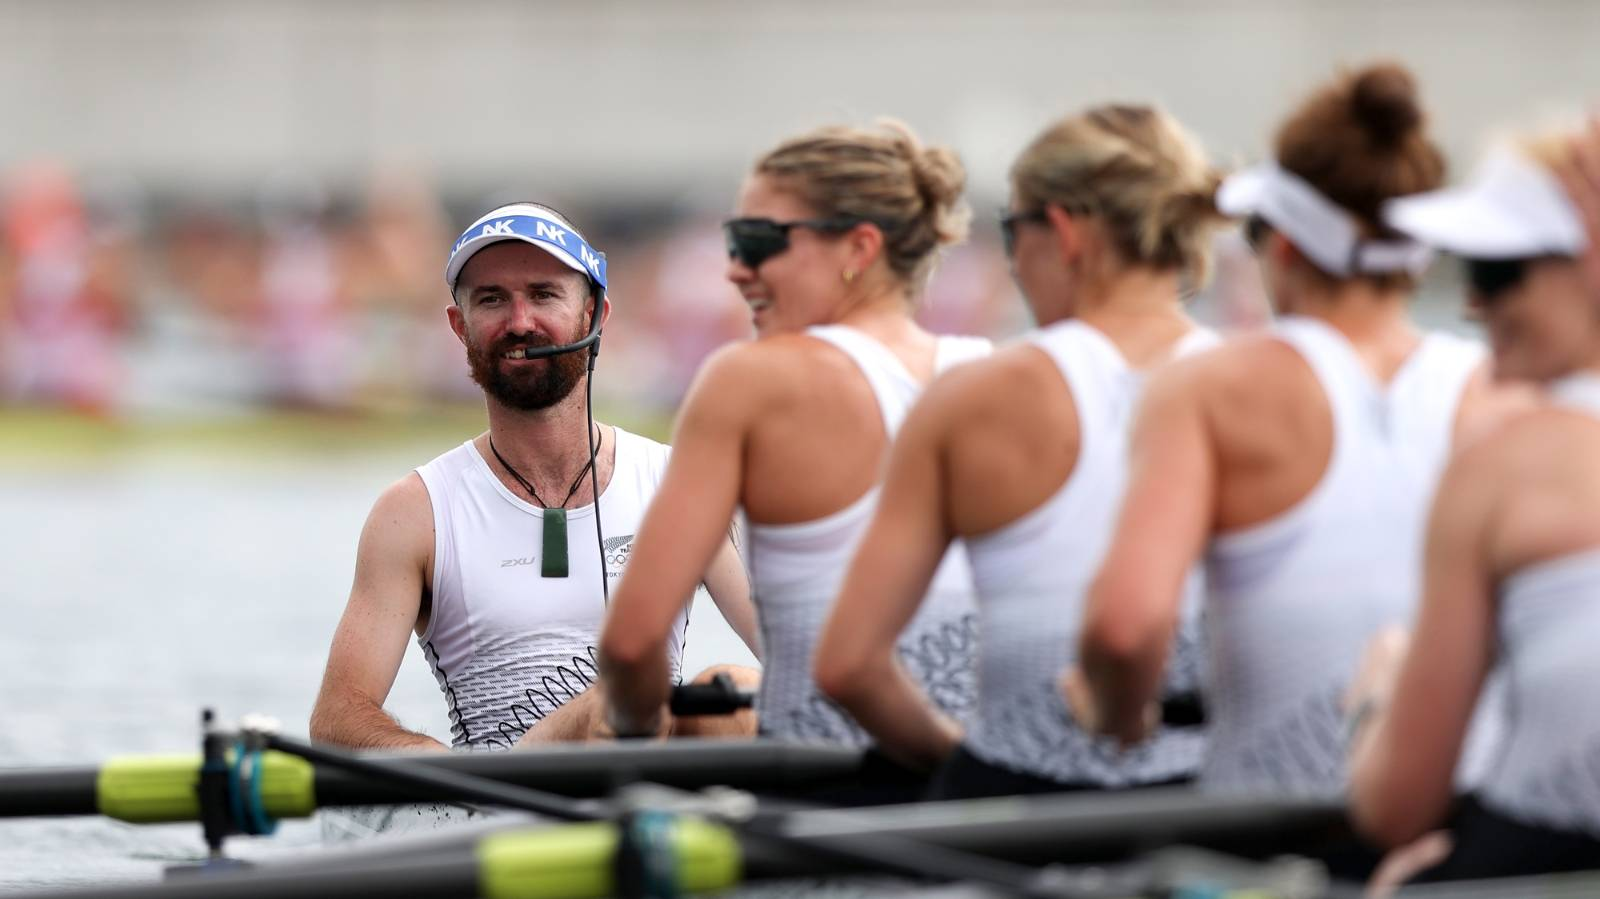 Caleb Shepherd: A man winning silver in a woman's world